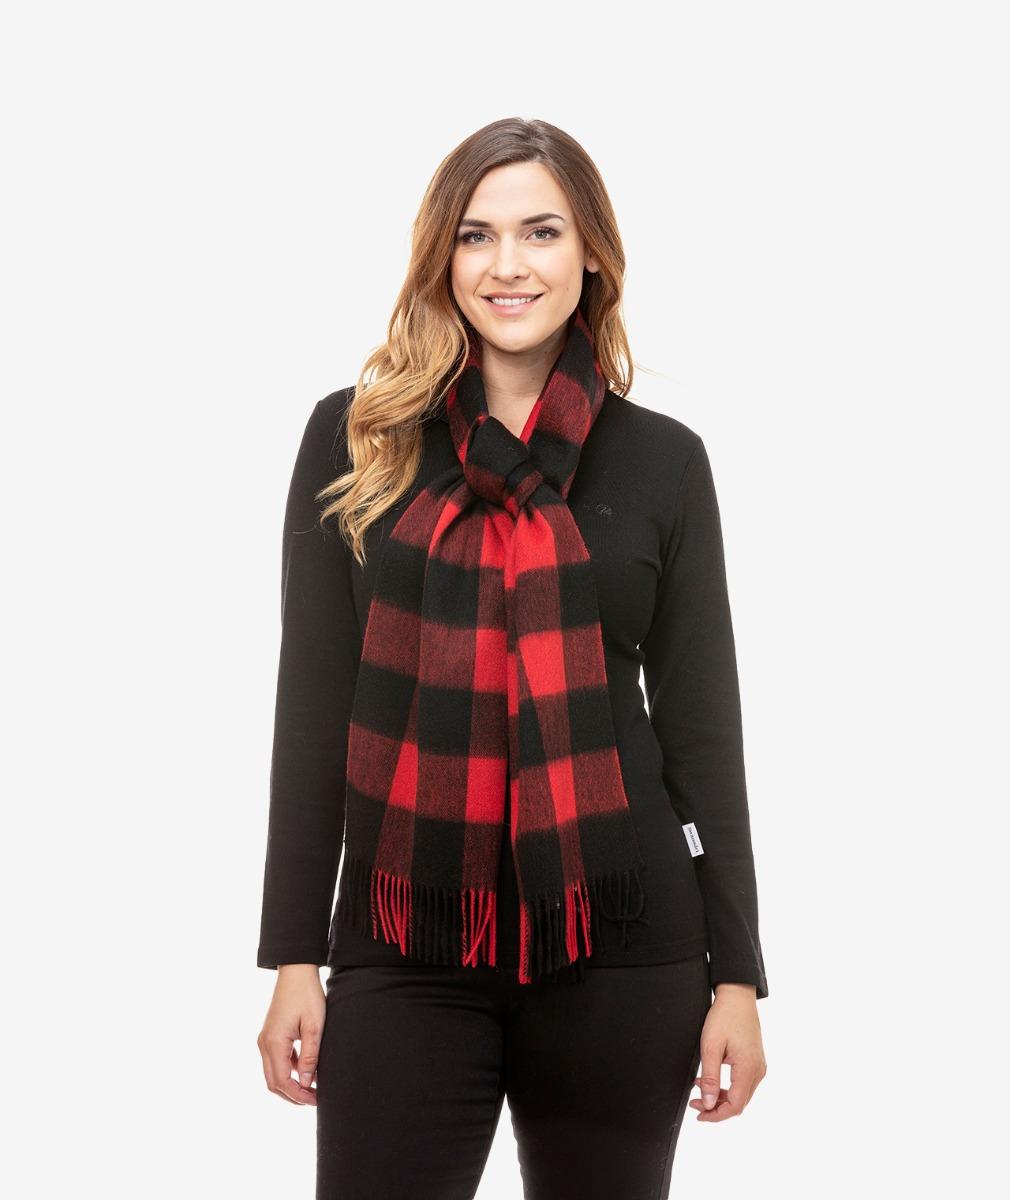 Swanndri Unisex 100% Wool Scarfie in Red/Black Check